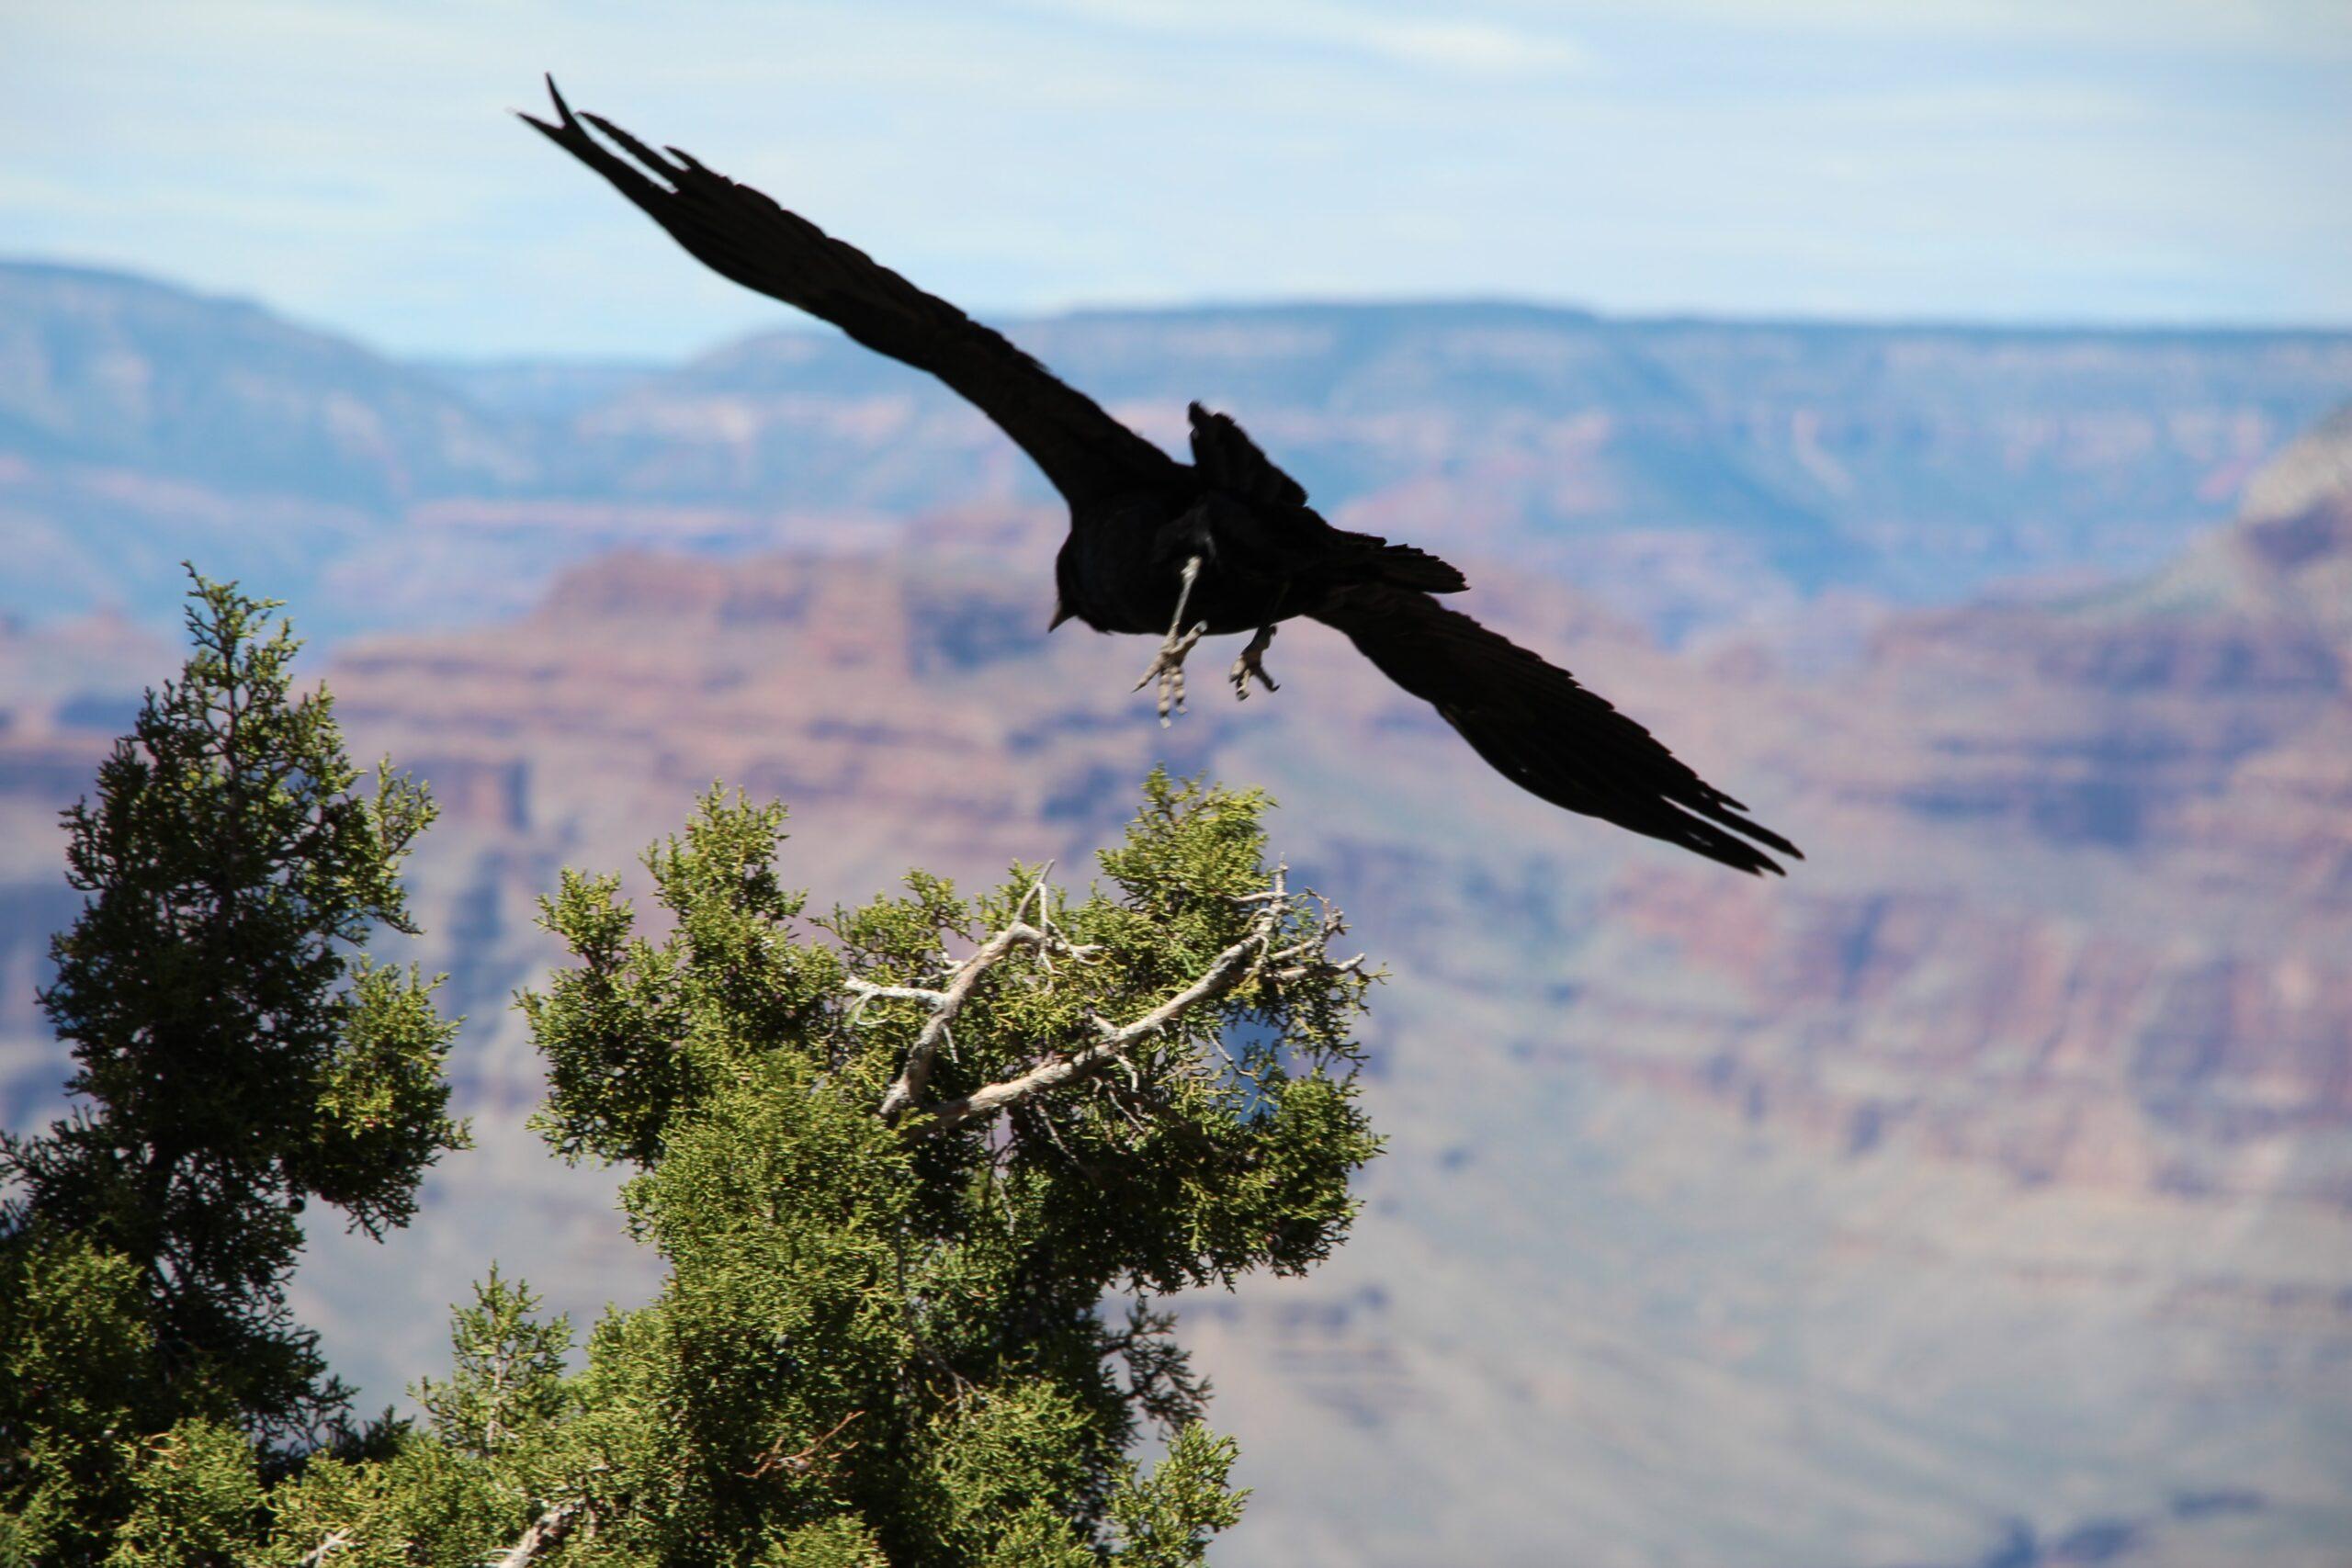 Black Crow in flight high desert Alex povolyashko